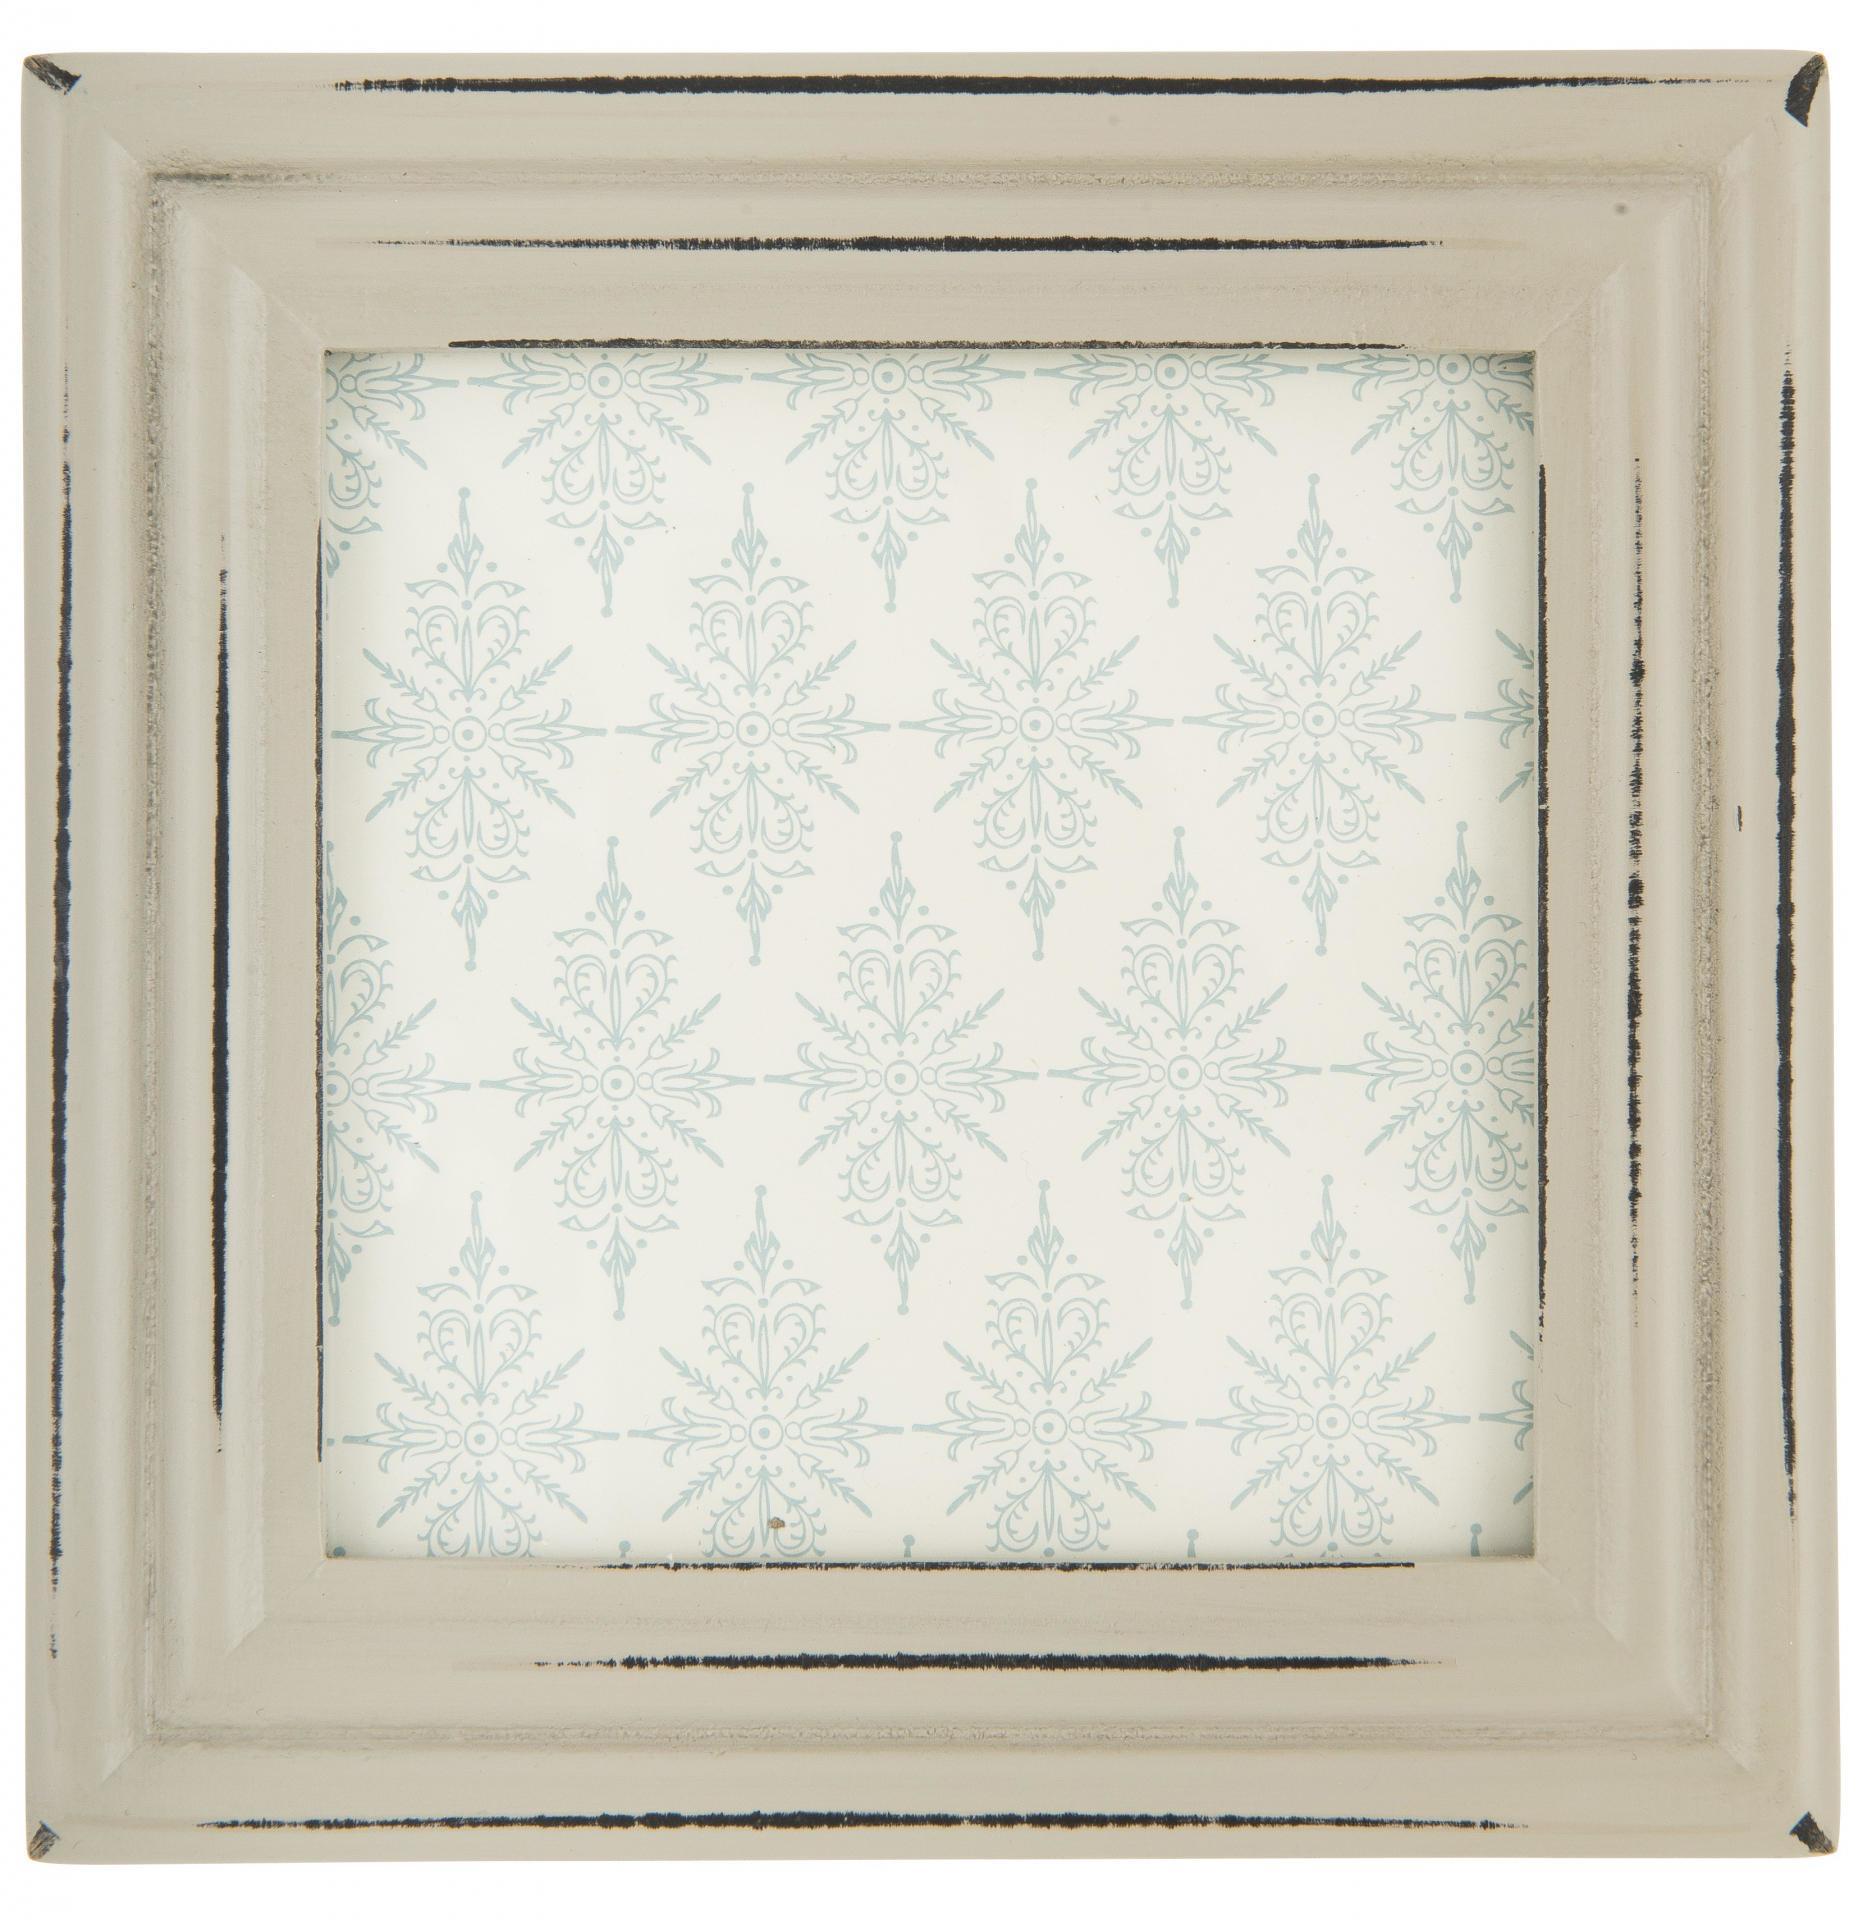 IB LAURSEN Dřevěný rámeček Mix-It Grey (foto 8,5x8,5 cm), šedá barva, dřevo